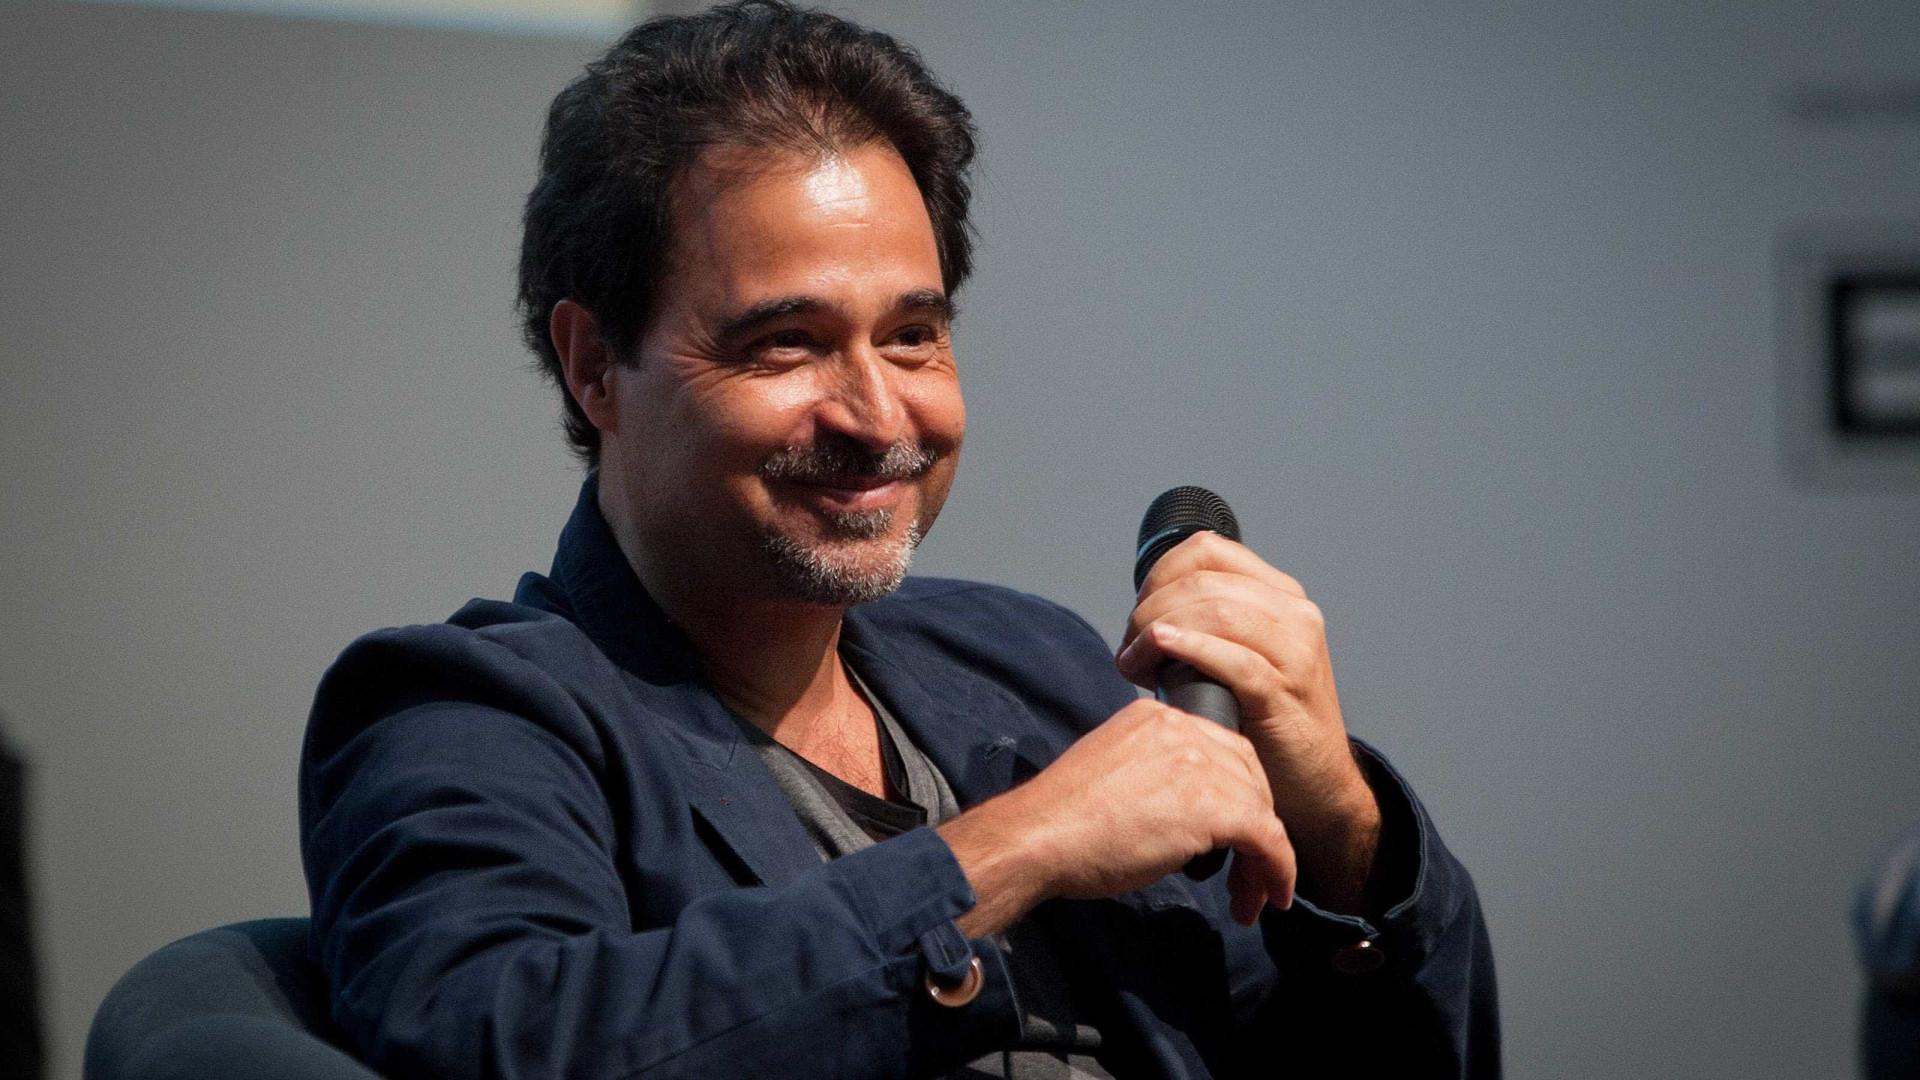 José Eduardo Agualusa participa no Festival de Literatura de Berlim